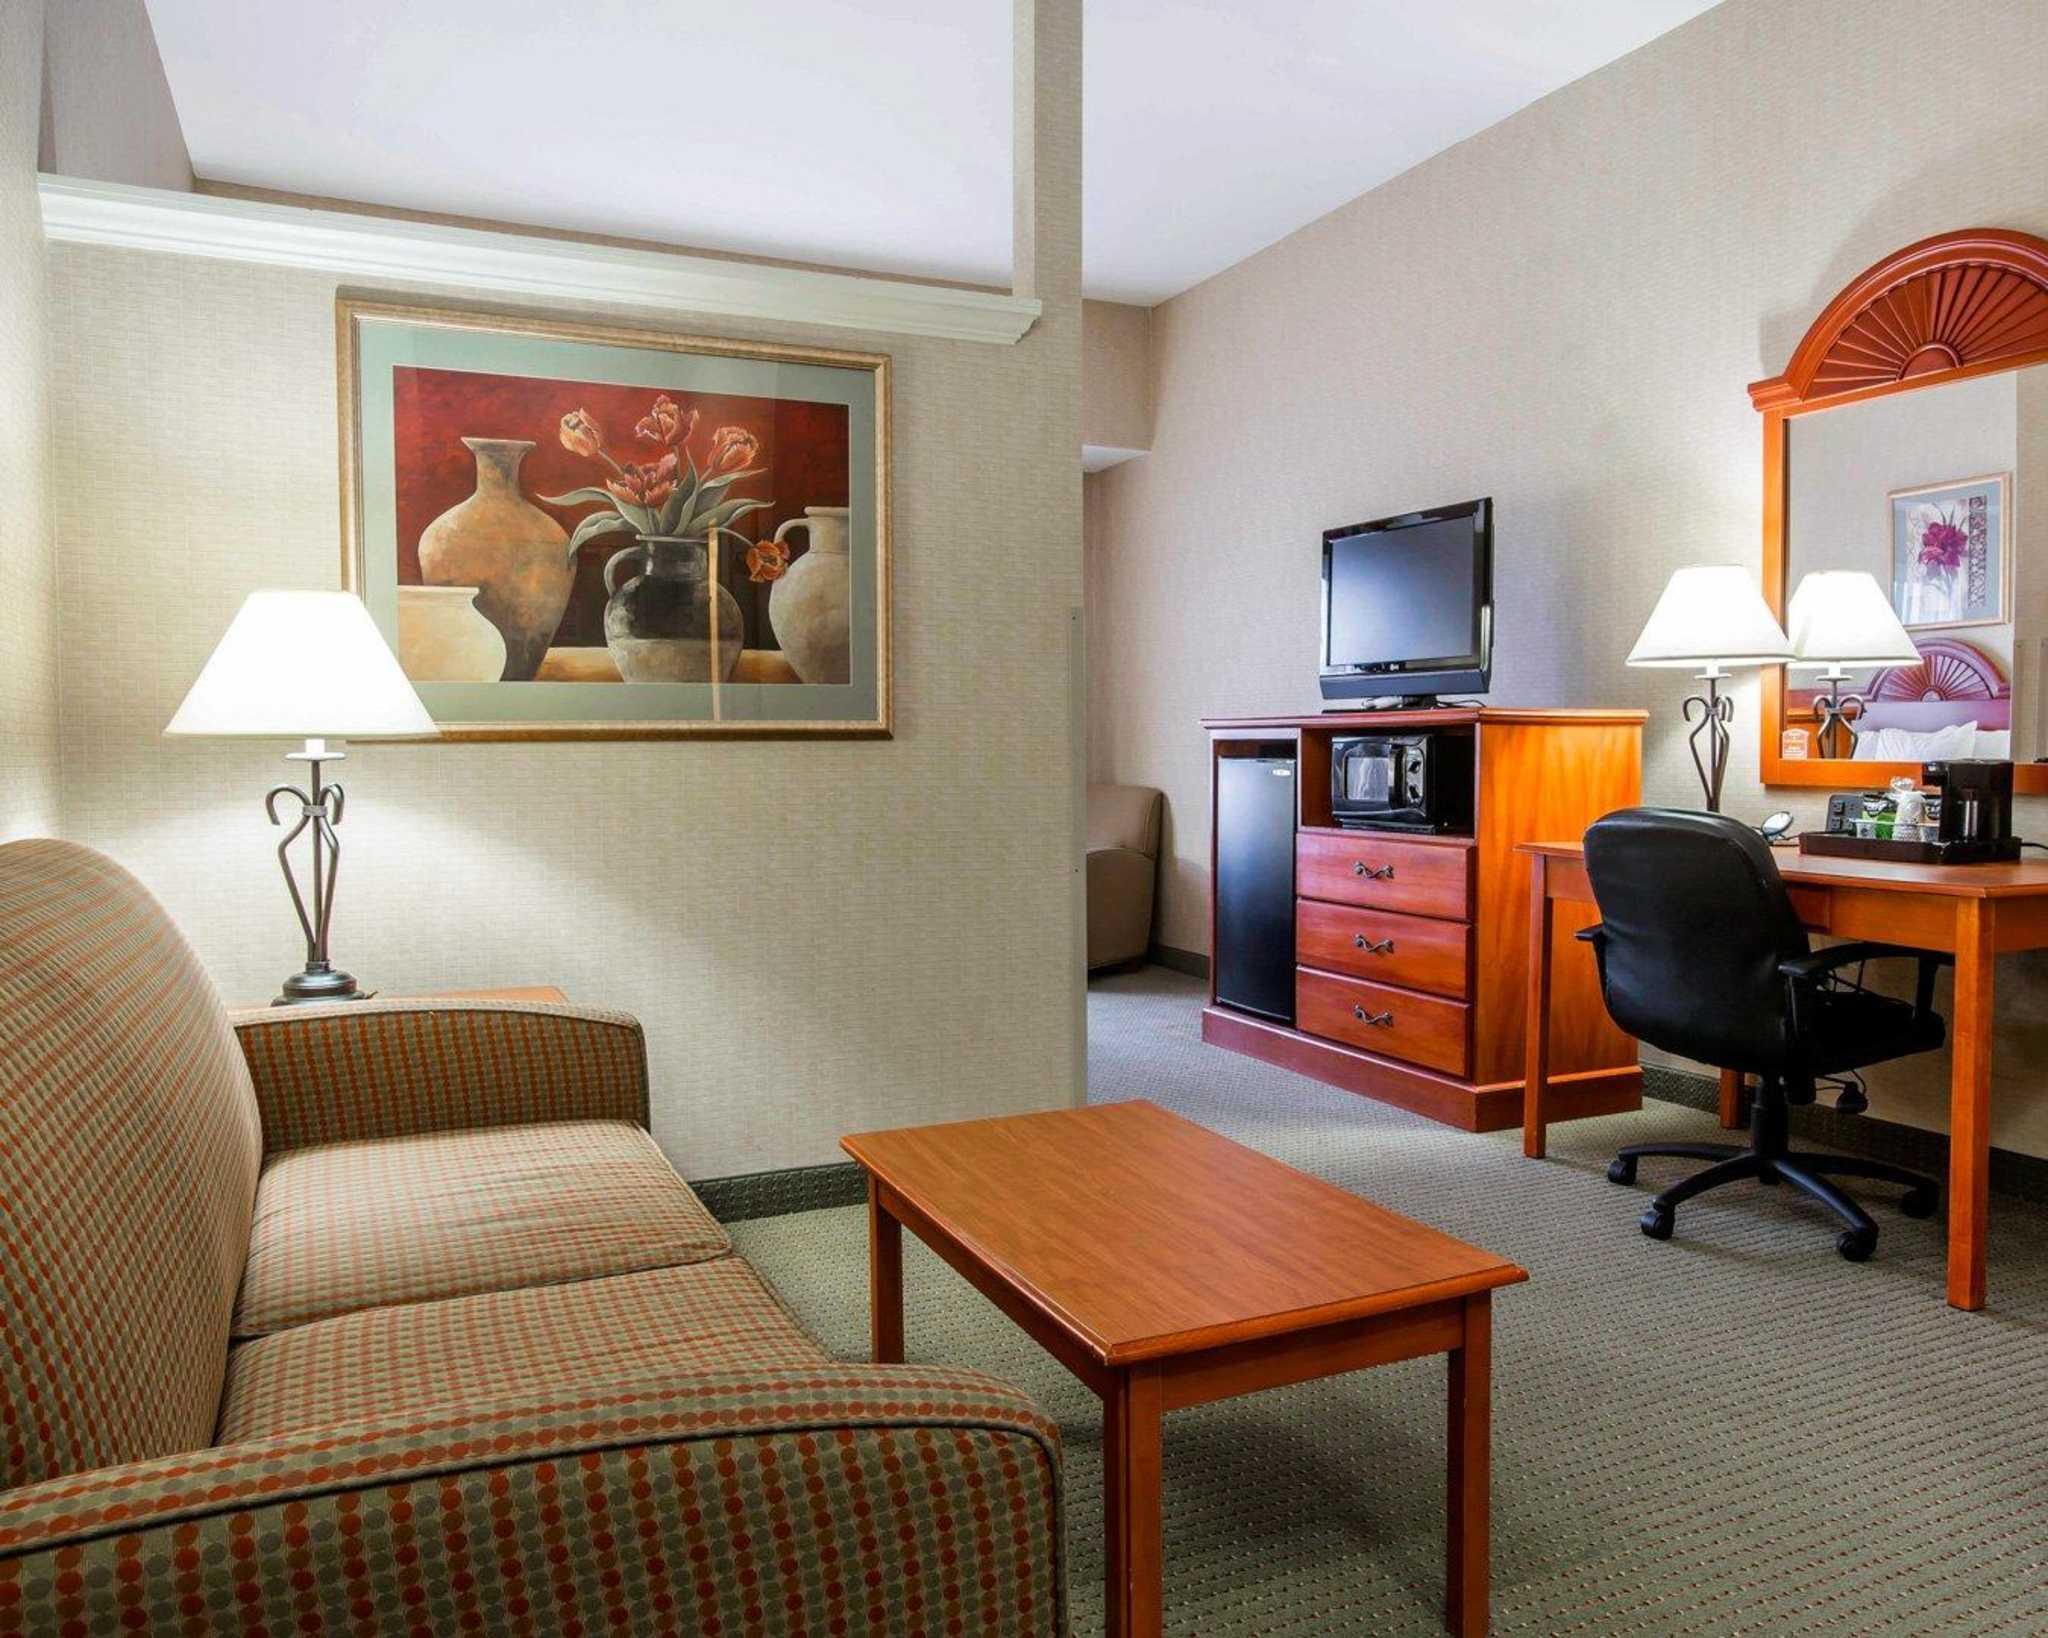 Comfort Inn & Suites adj to Akwesasne Mohawk Casino image 52